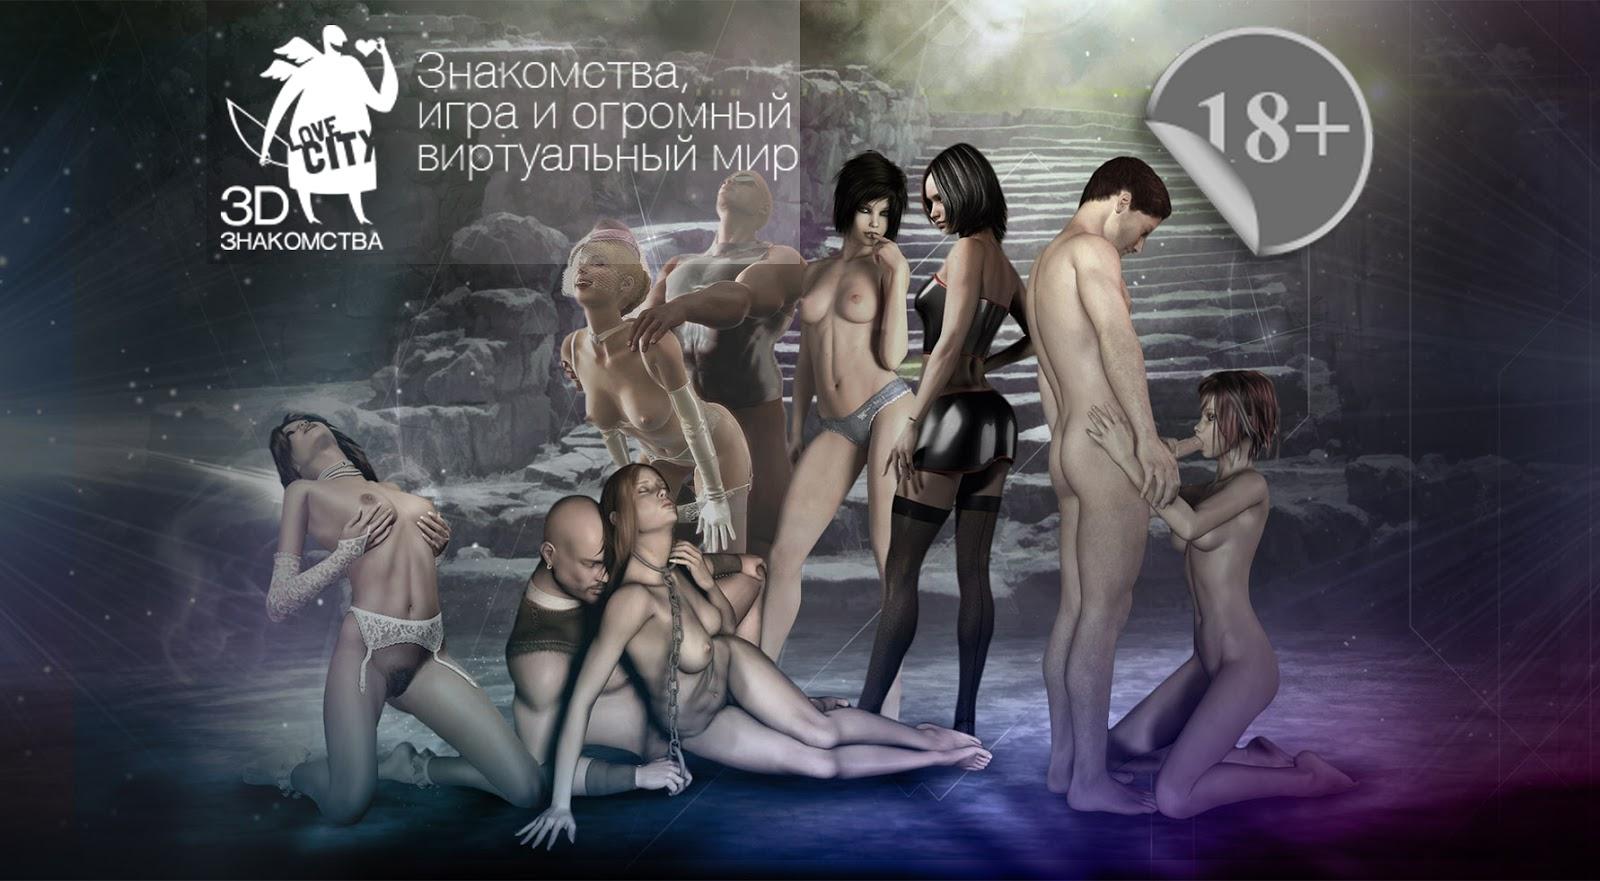 erotik-siti-katalog